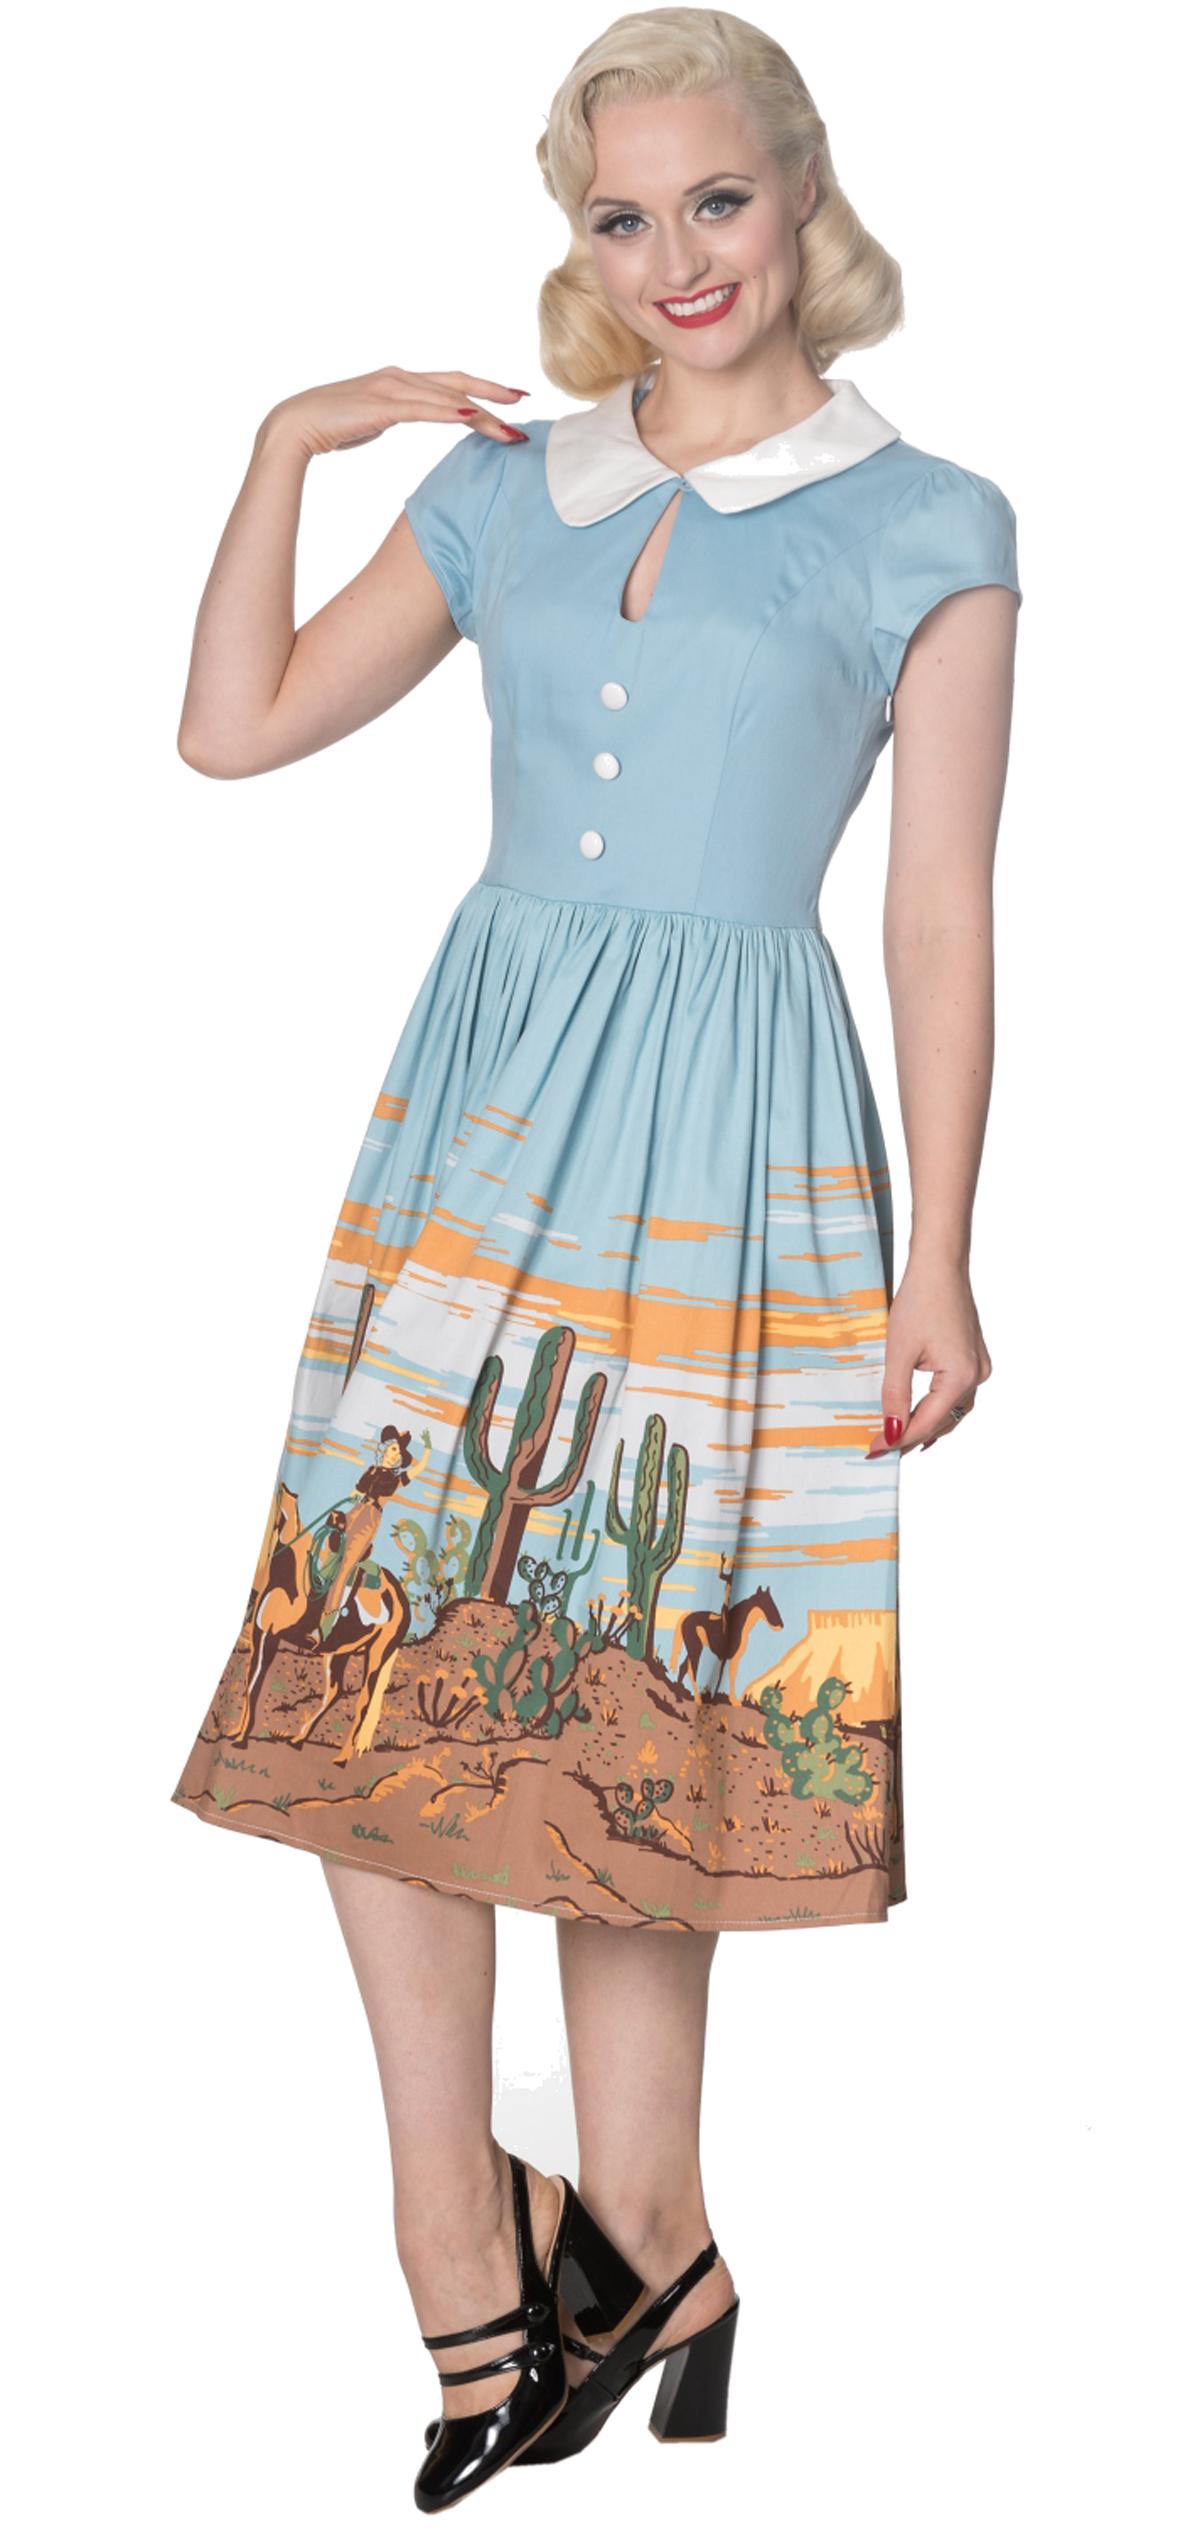 Dancing Days MAGICAL Western Cowboy Vintage Retro DRESS ...